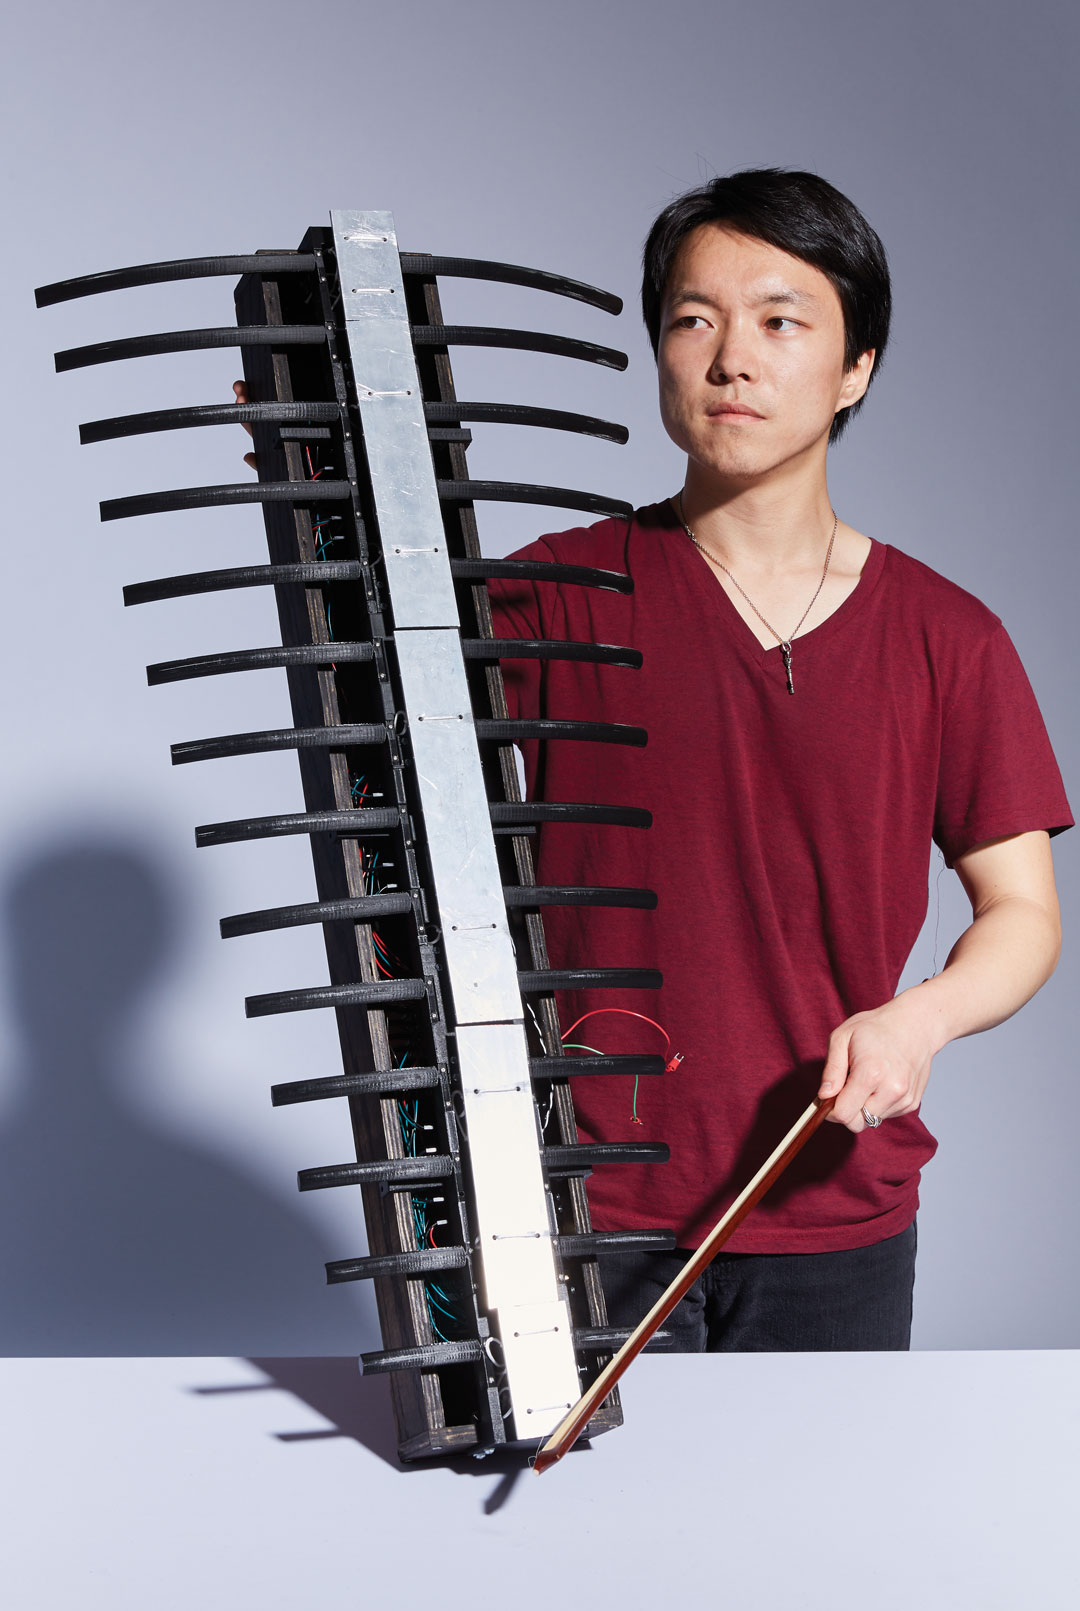 Takumi Ogata